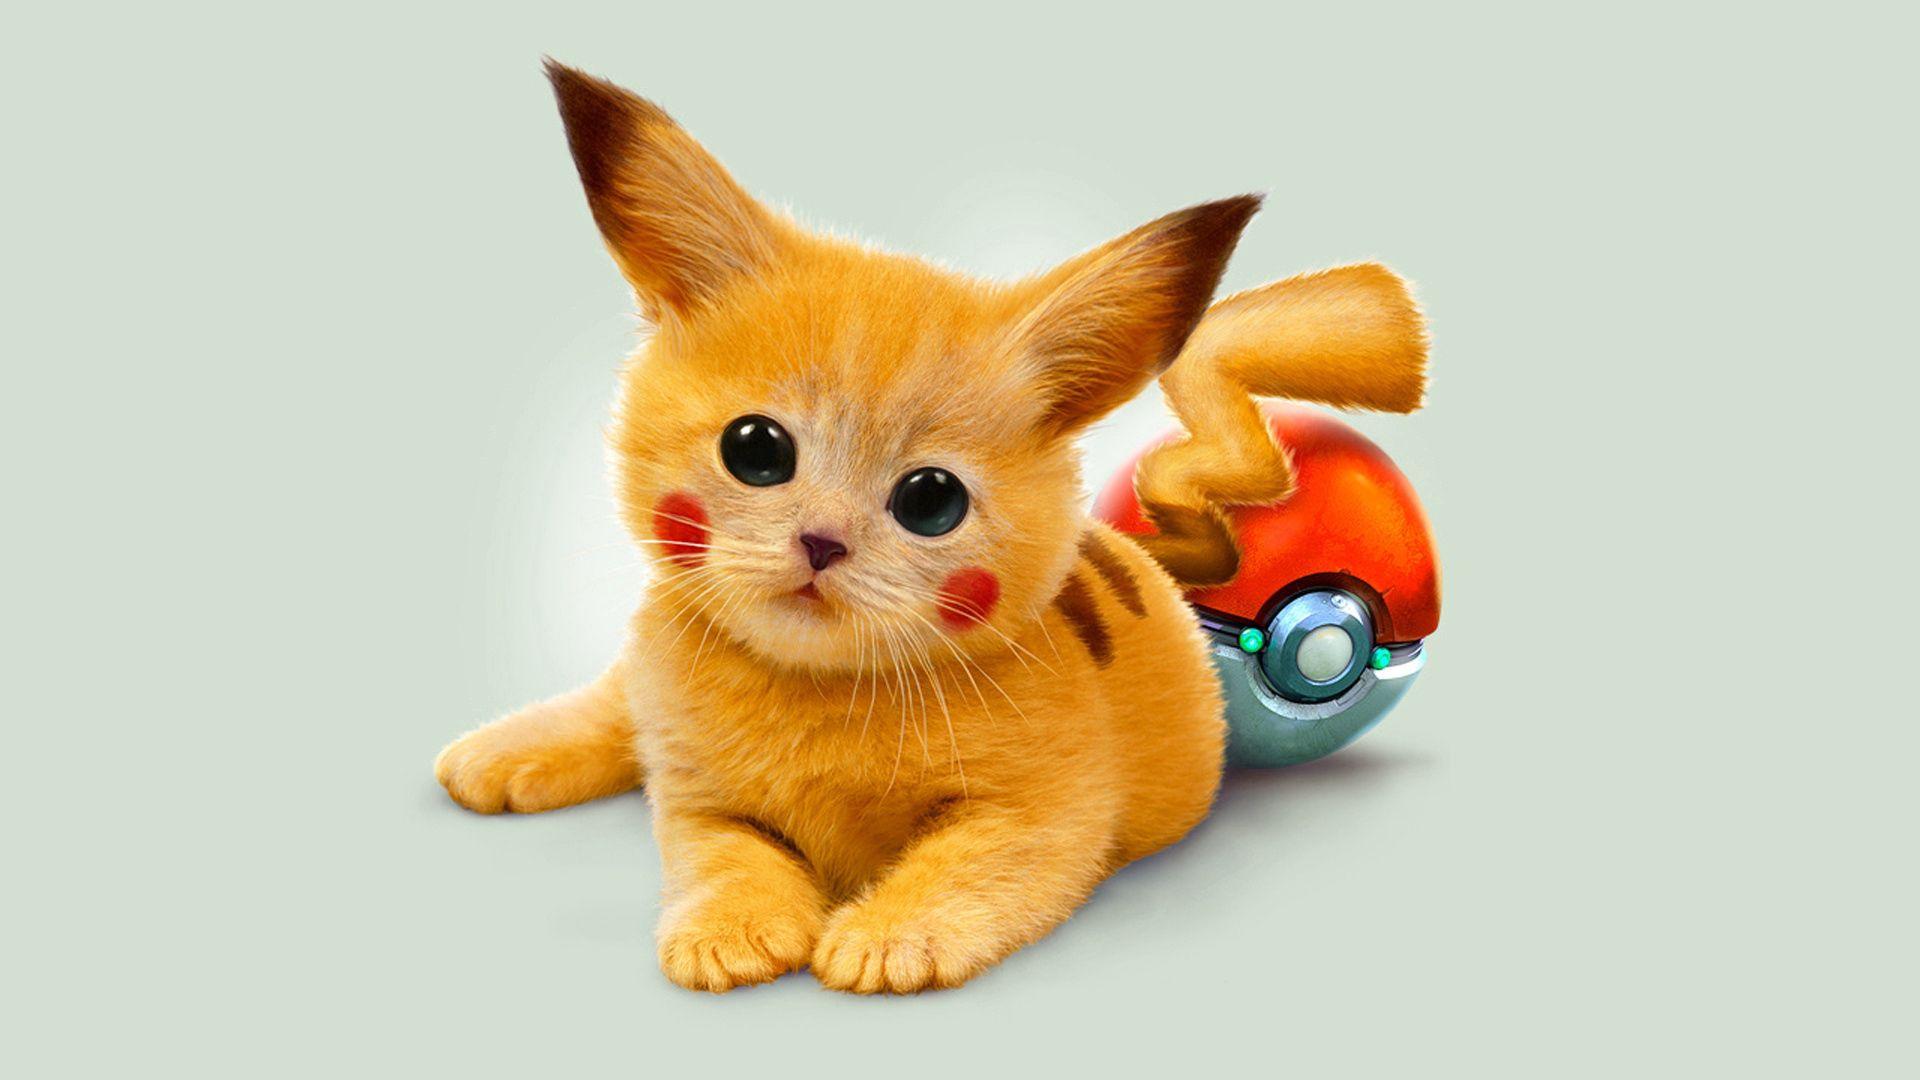 1920x1080 Wallpaper art, kitty, pokemon, red eyes, pikachu